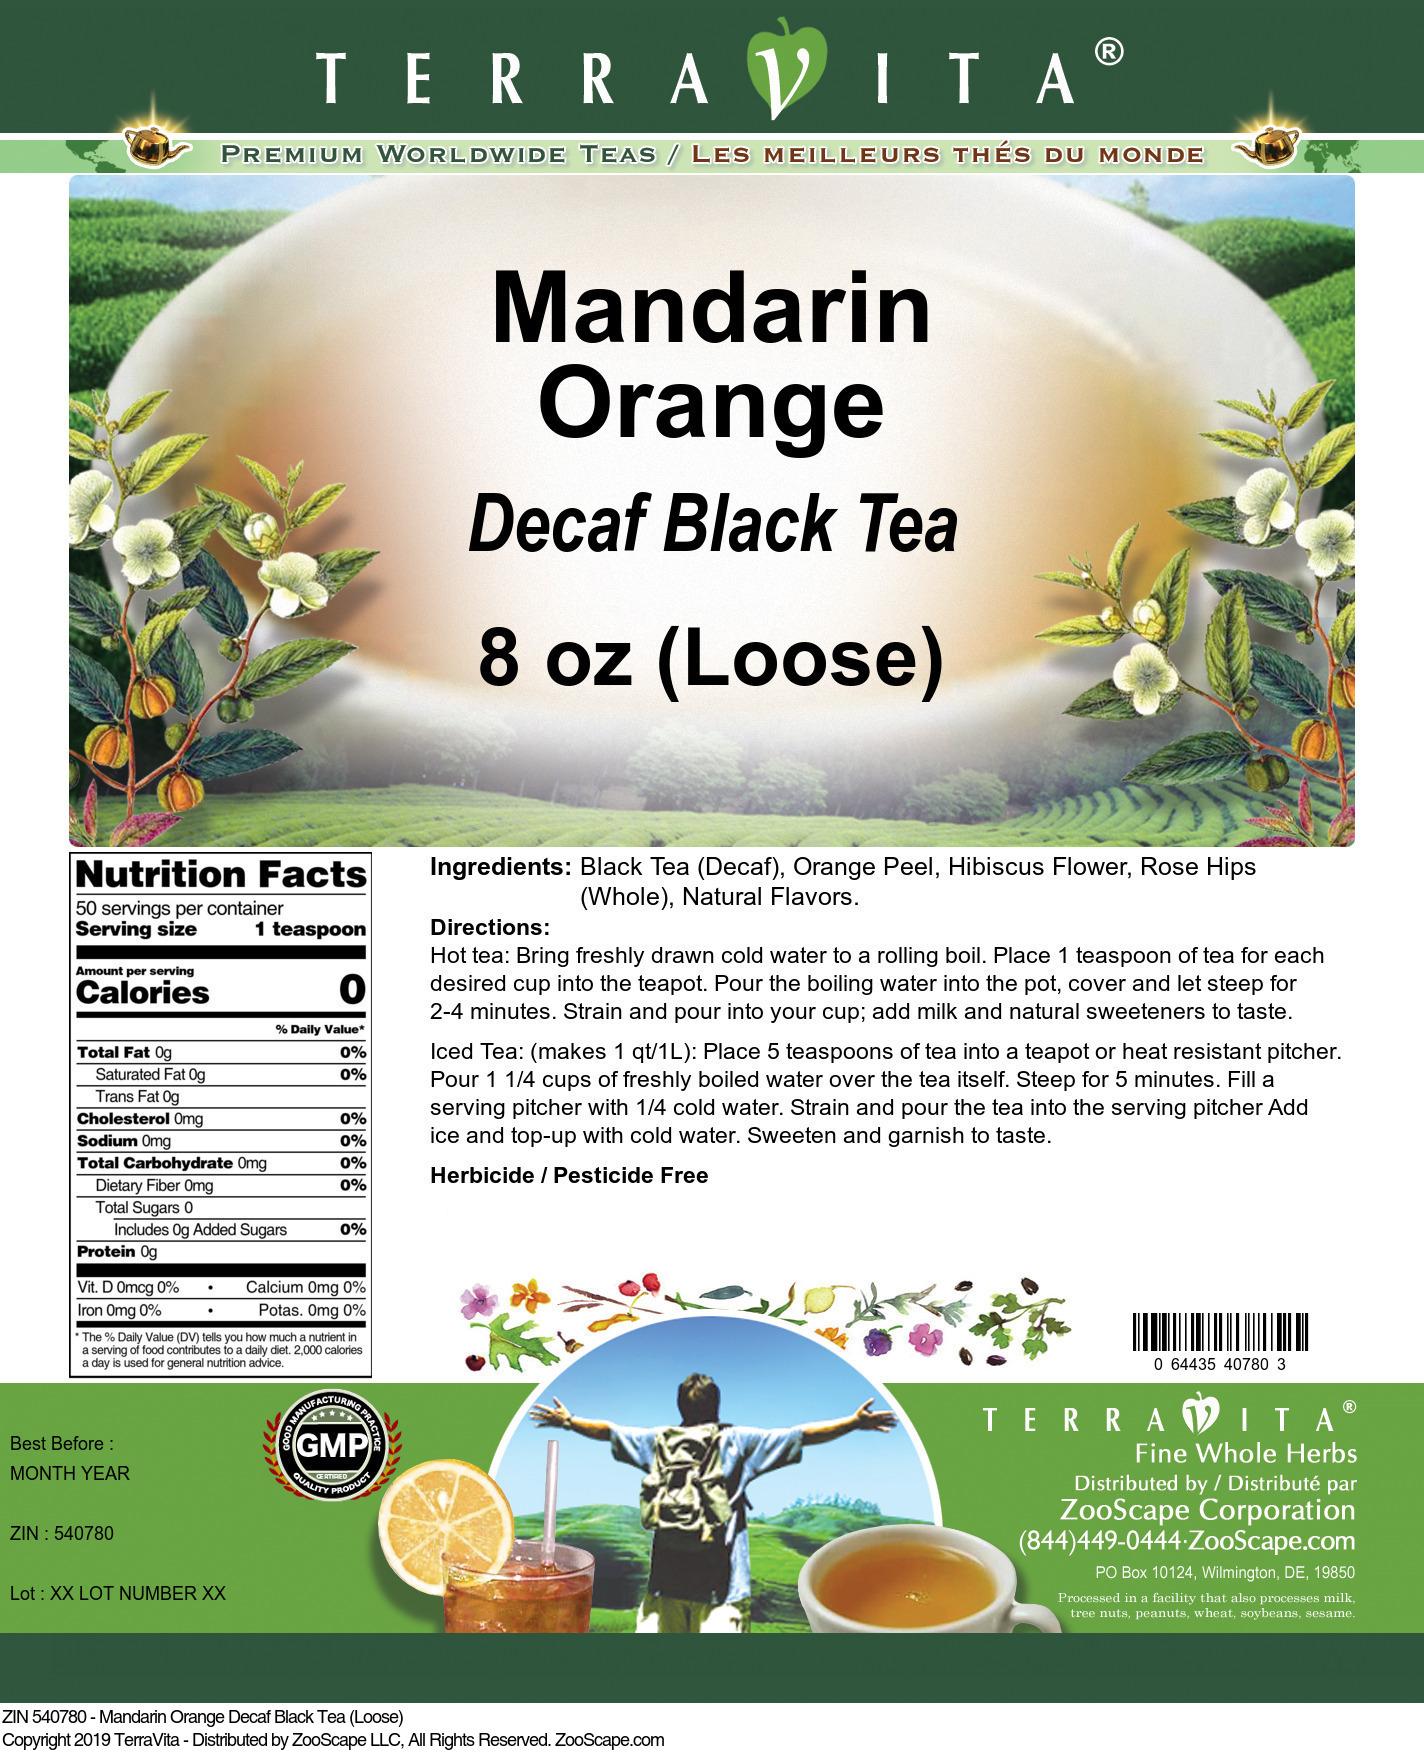 Mandarin Orange Decaf Black Tea (Loose)